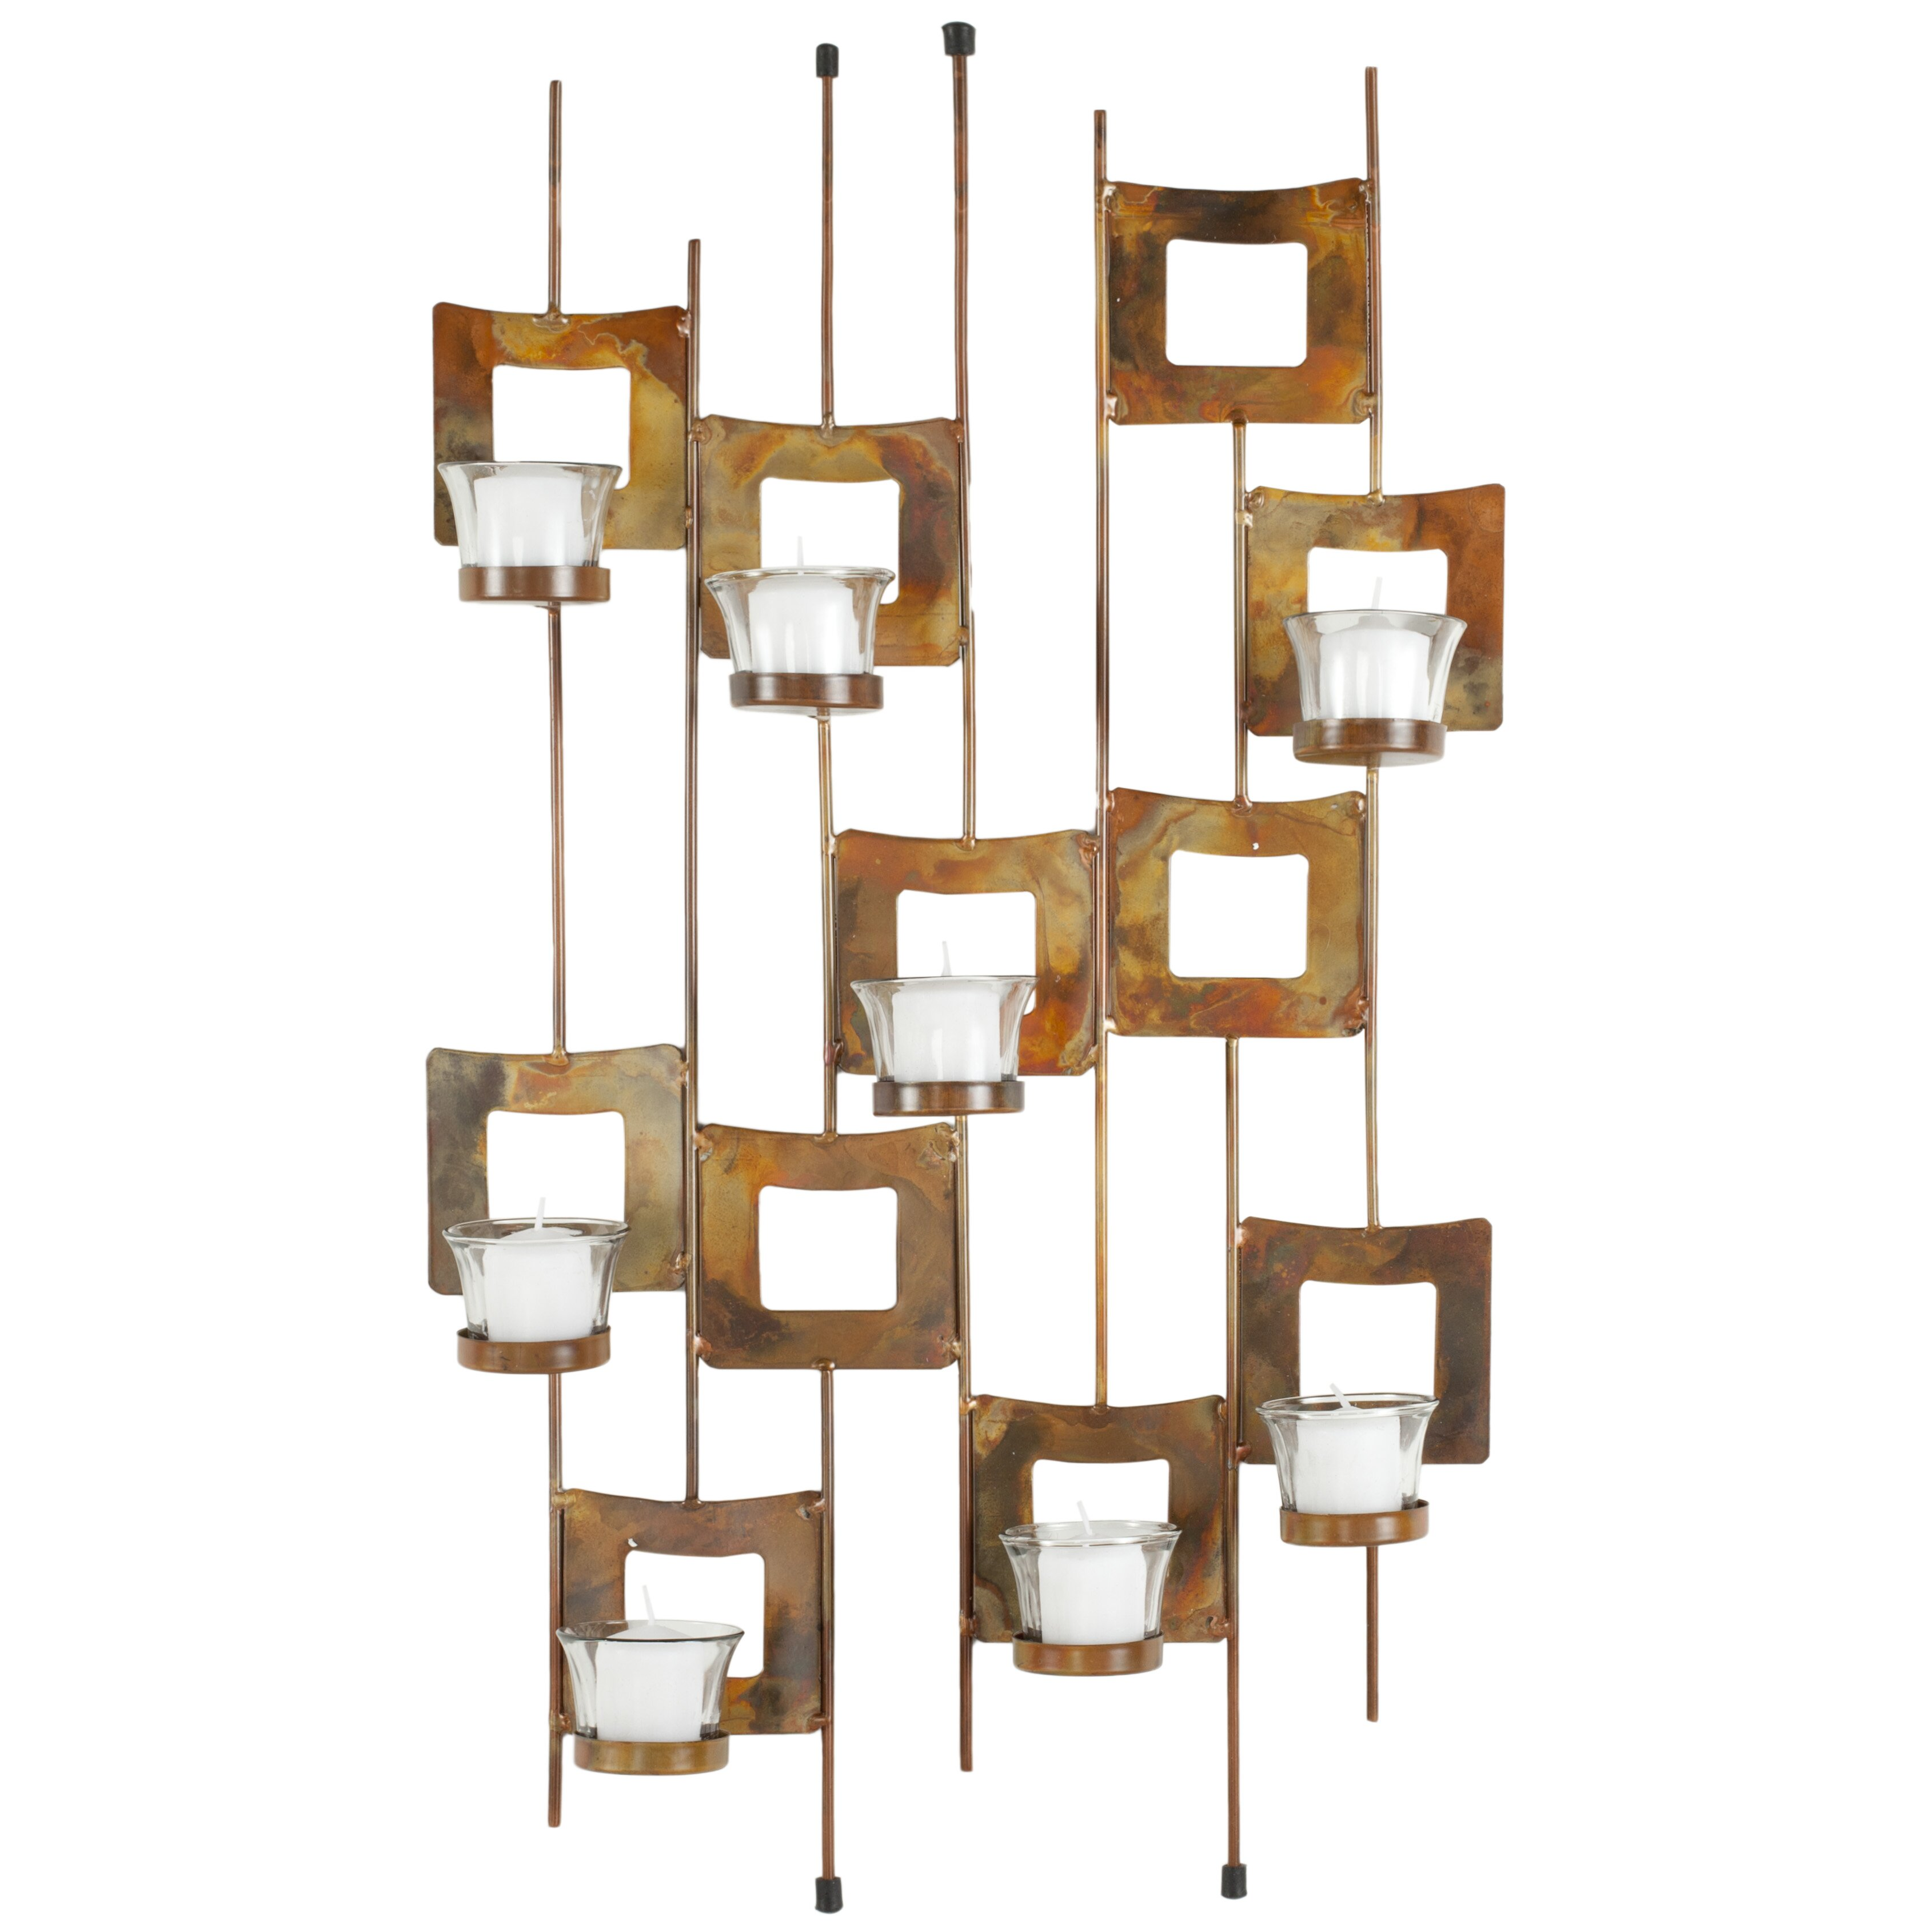 Safavieh votive wall decor reviews wayfair - Candle holders wall decor ...